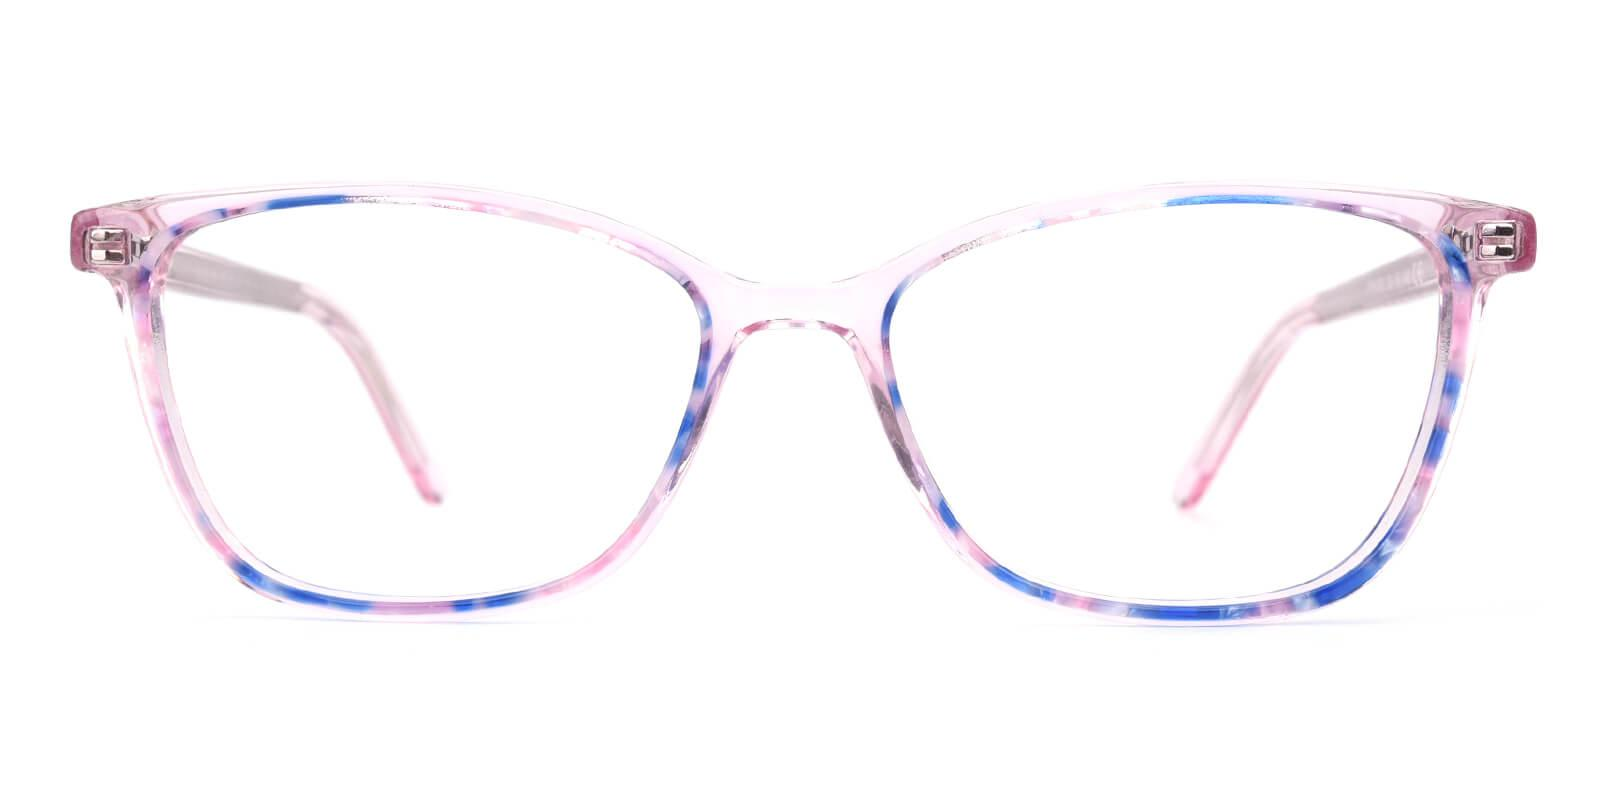 Darleney-Pink-Cat-Acetate-Eyeglasses-additional2